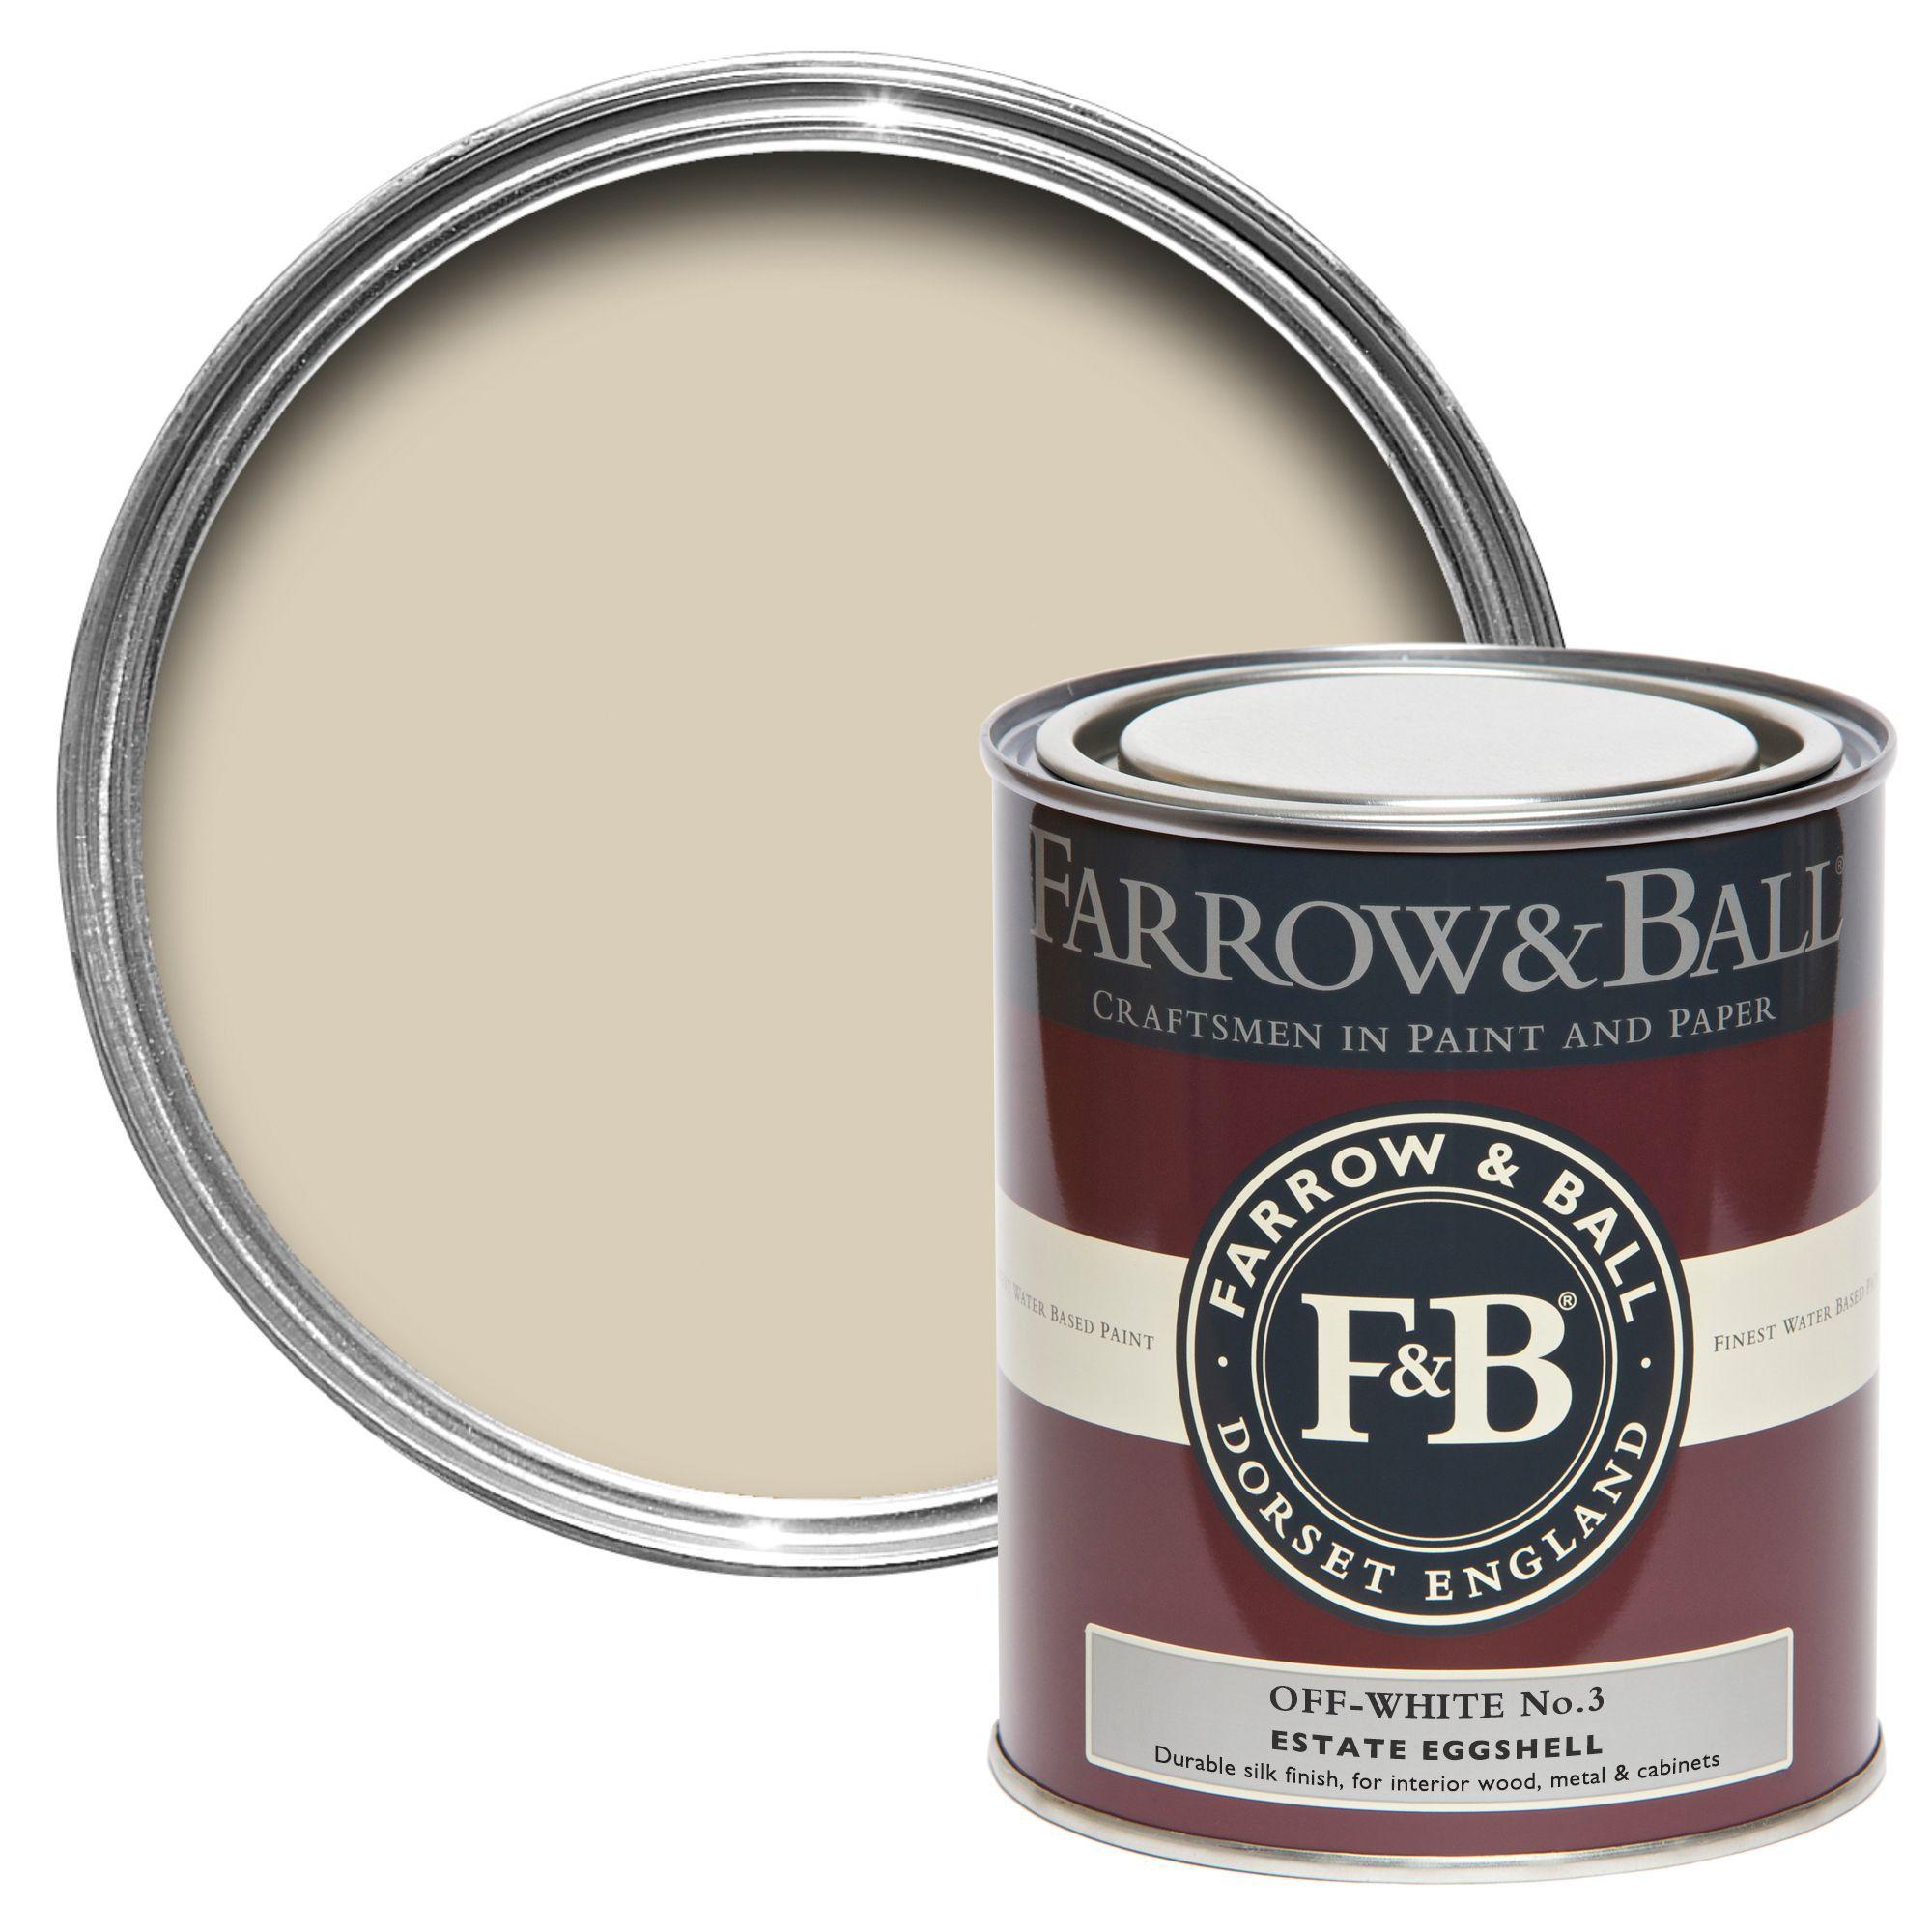 Farrow ball off white no 3 estate eggshell paint 750 ml - Eggshell paint in bathroom ...